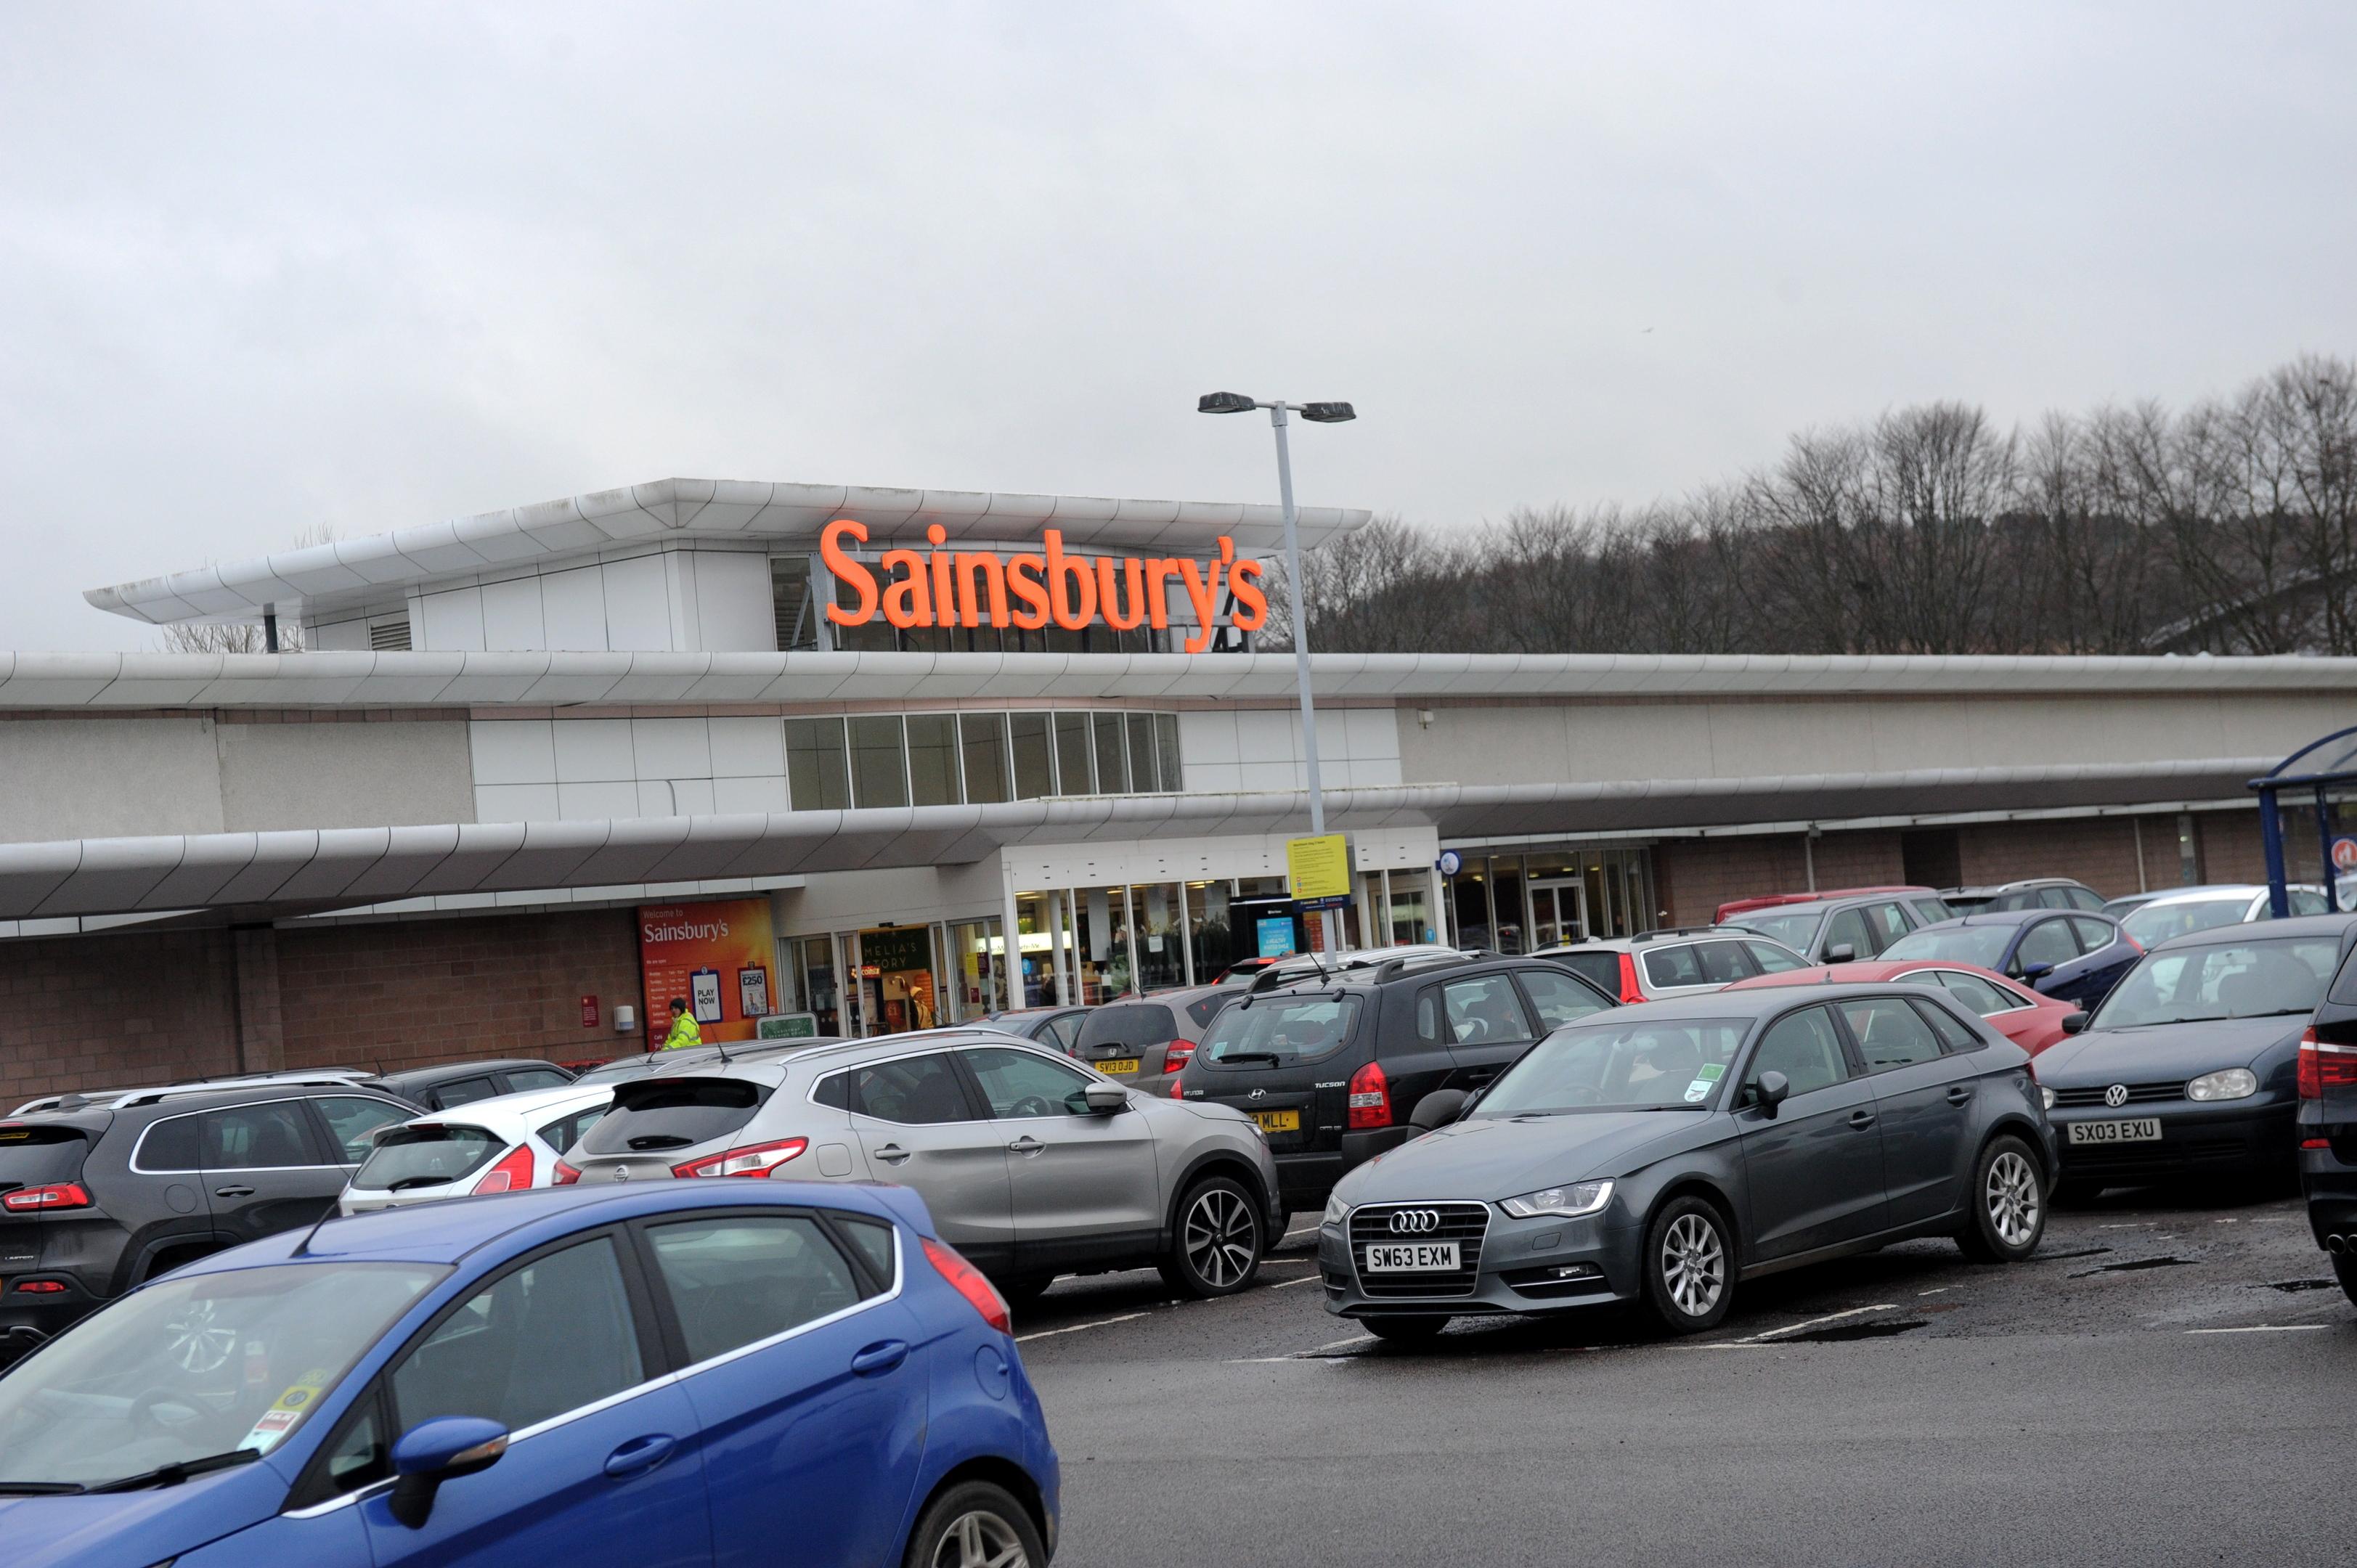 The Sainsbury's supermarket in Garthdee.